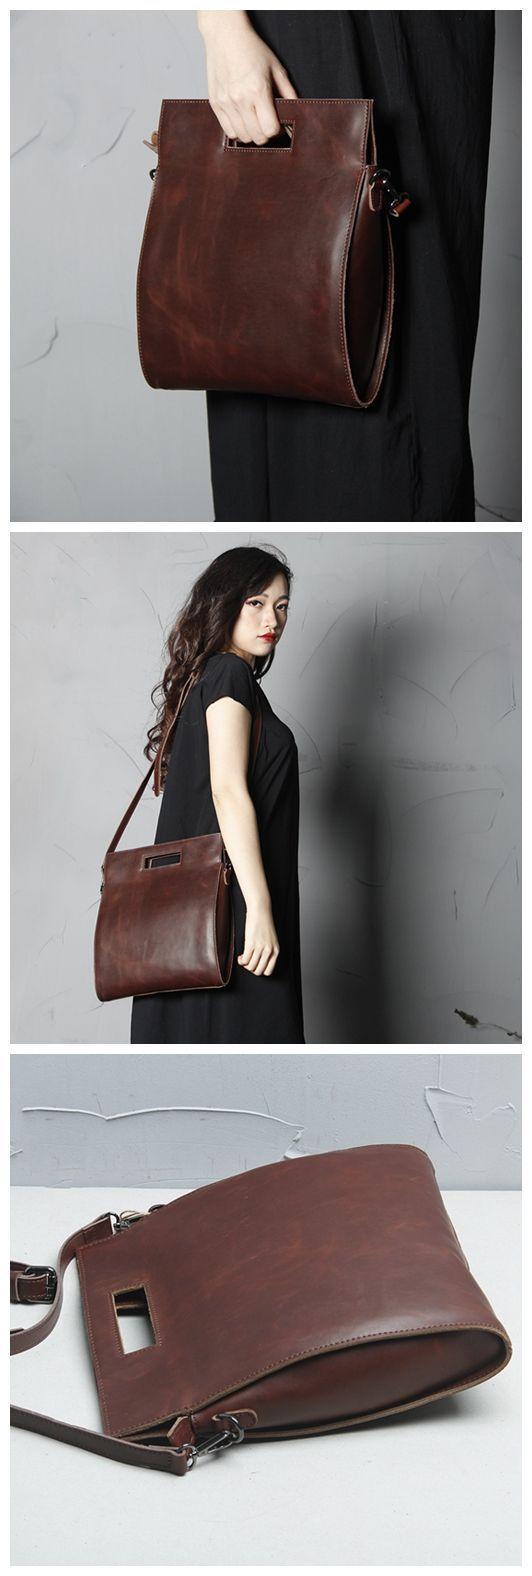 WOMEN TOTE, SHOPPING BAG, WOMEN FASHION, ELEGANT BAG, SHOULDER BAG, CUSTOM… - ladies shoulder bags online shopping, bags online for womens, leather bags on sale *sponsored https://www.pinterest.com/bags_bag/ https://www.pinterest.com/explore/bags/ https://www.pinterest.com/bags_bag/bags/ http://www.zara.com/us/en/collection-ss-17/woman/bags-c358019.html